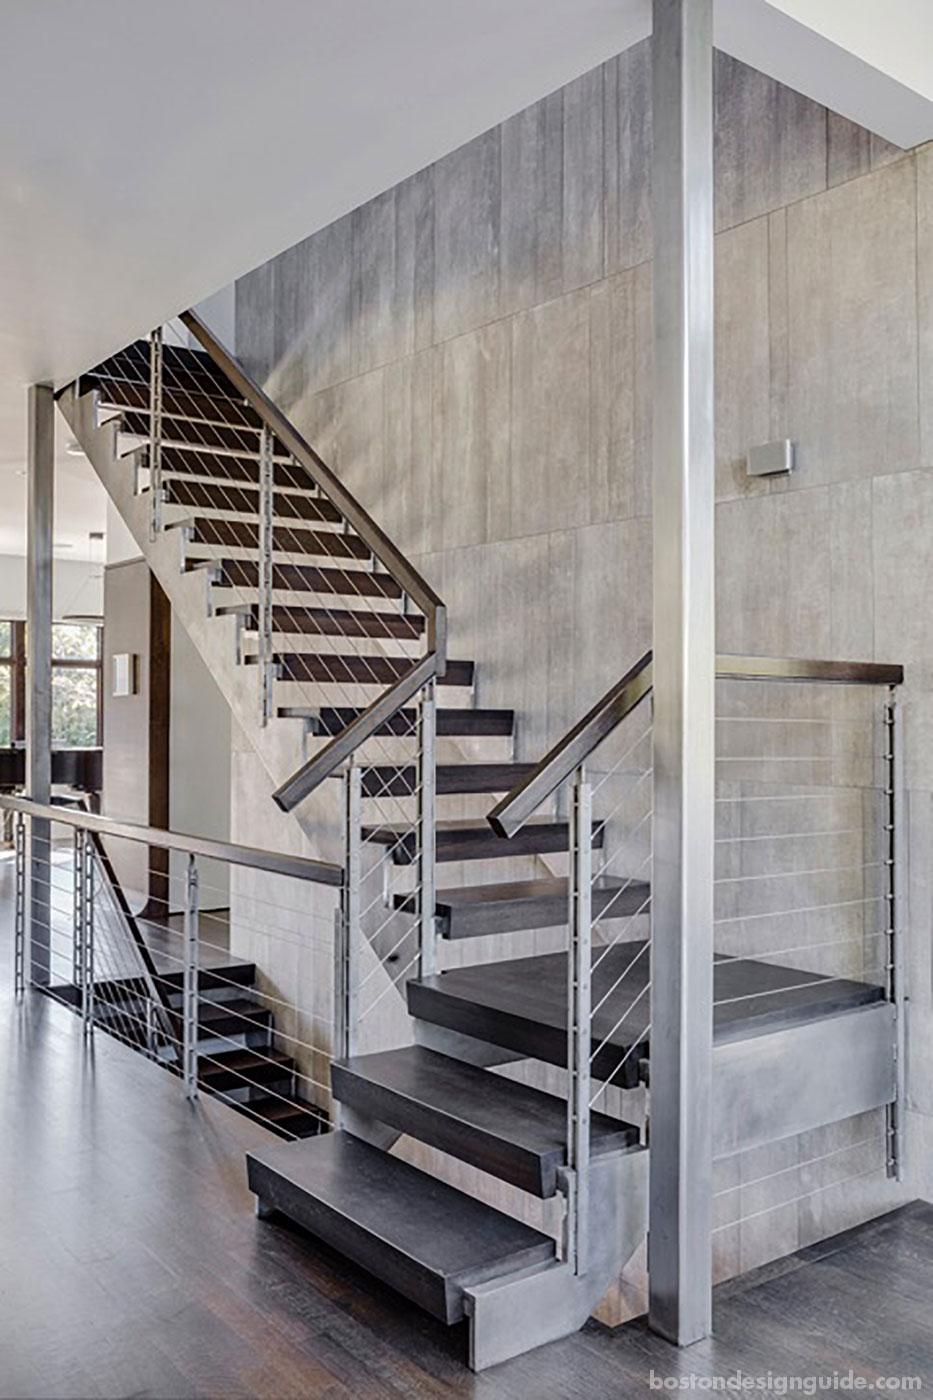 Architect Treffle LaFleche's stairway, built by Denali Construction Corp.